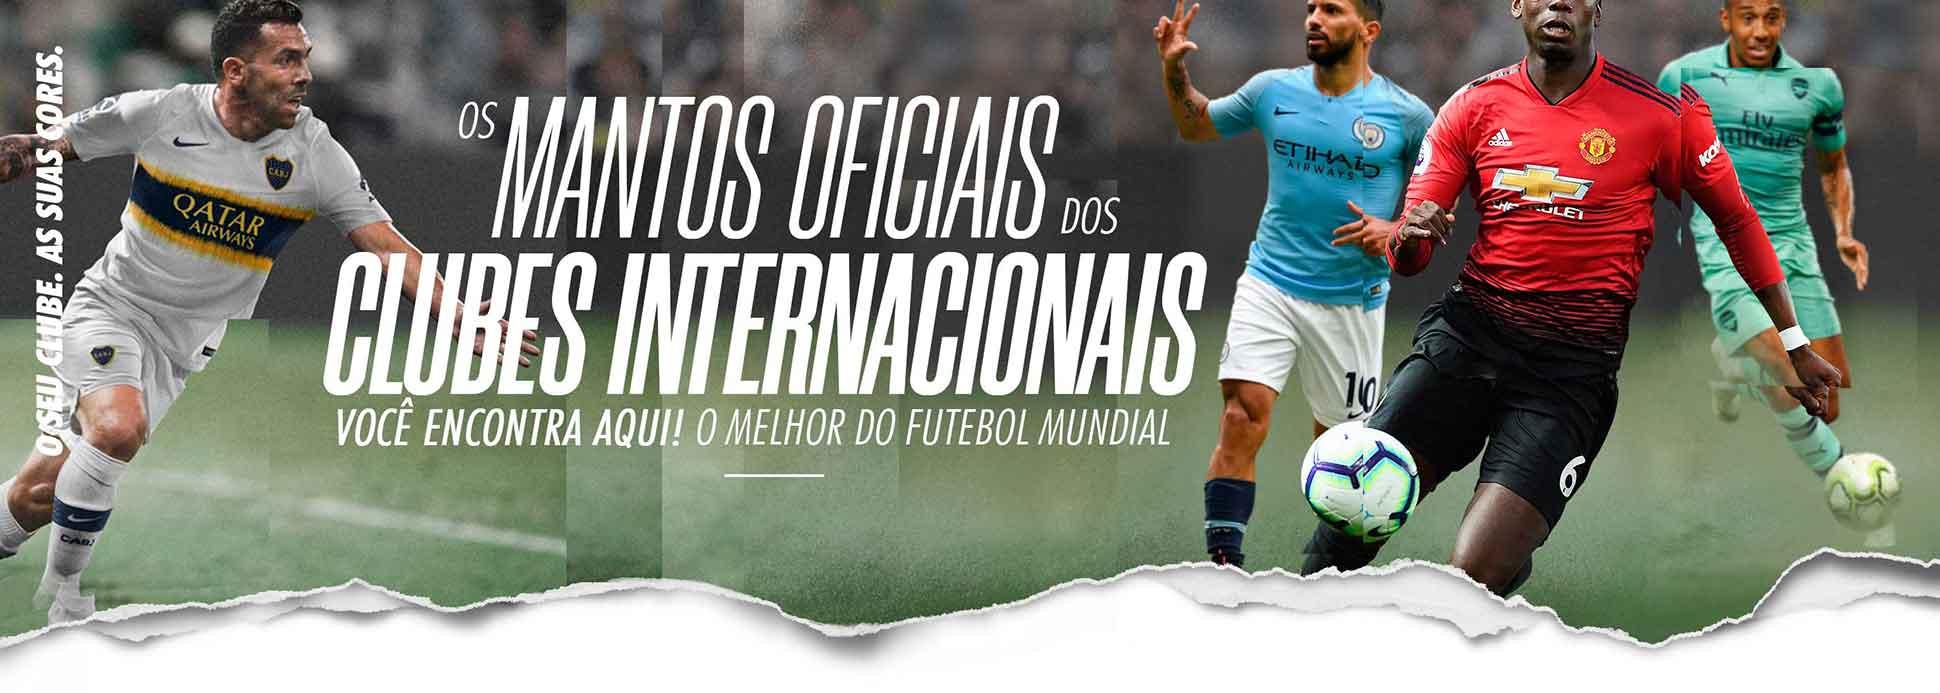 Black Friday Futebol Cia. 2553a54b854e0